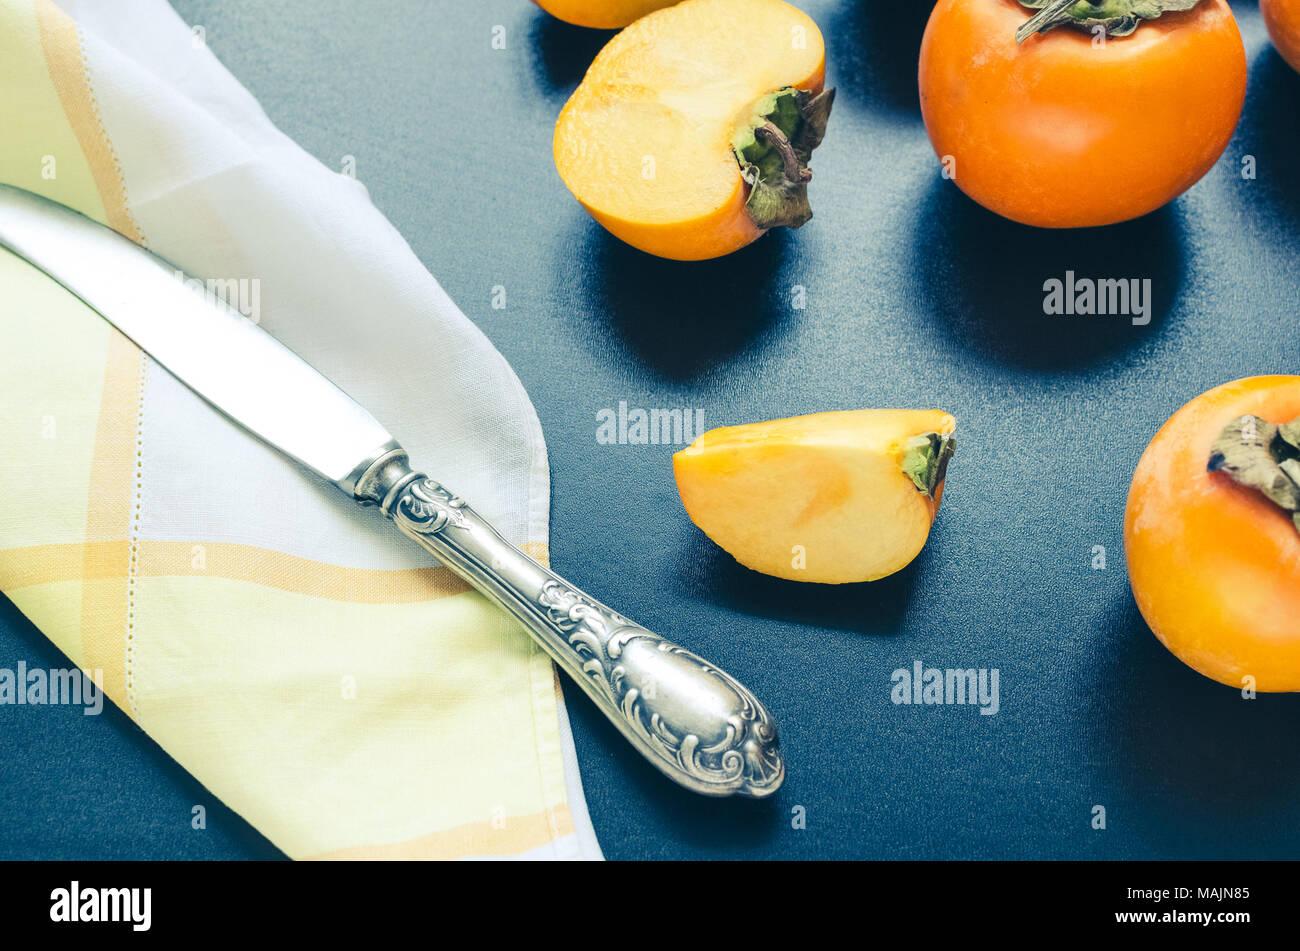 Slice of ripe delicious fresh persimmon kaki fruit with knife and napkin on black background. - Stock Image